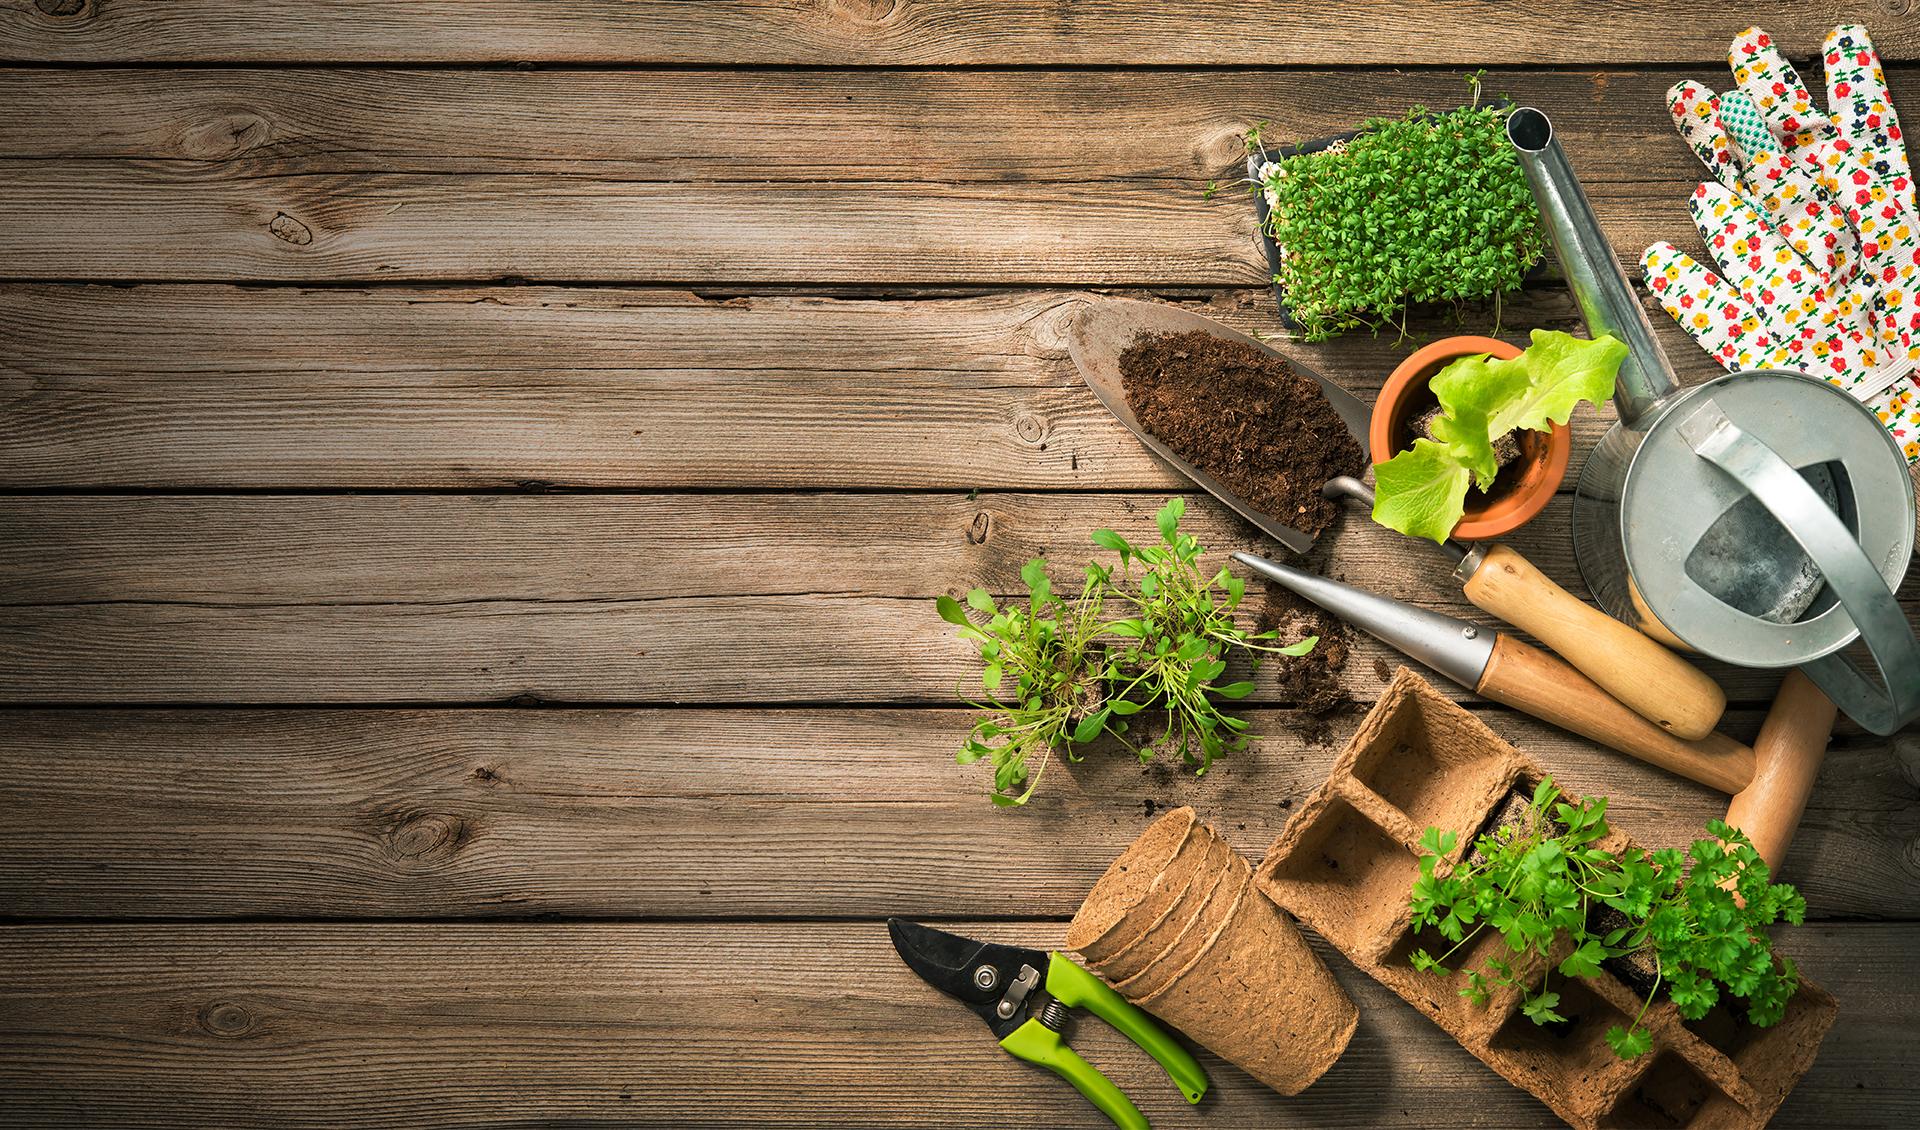 gardening tools plants